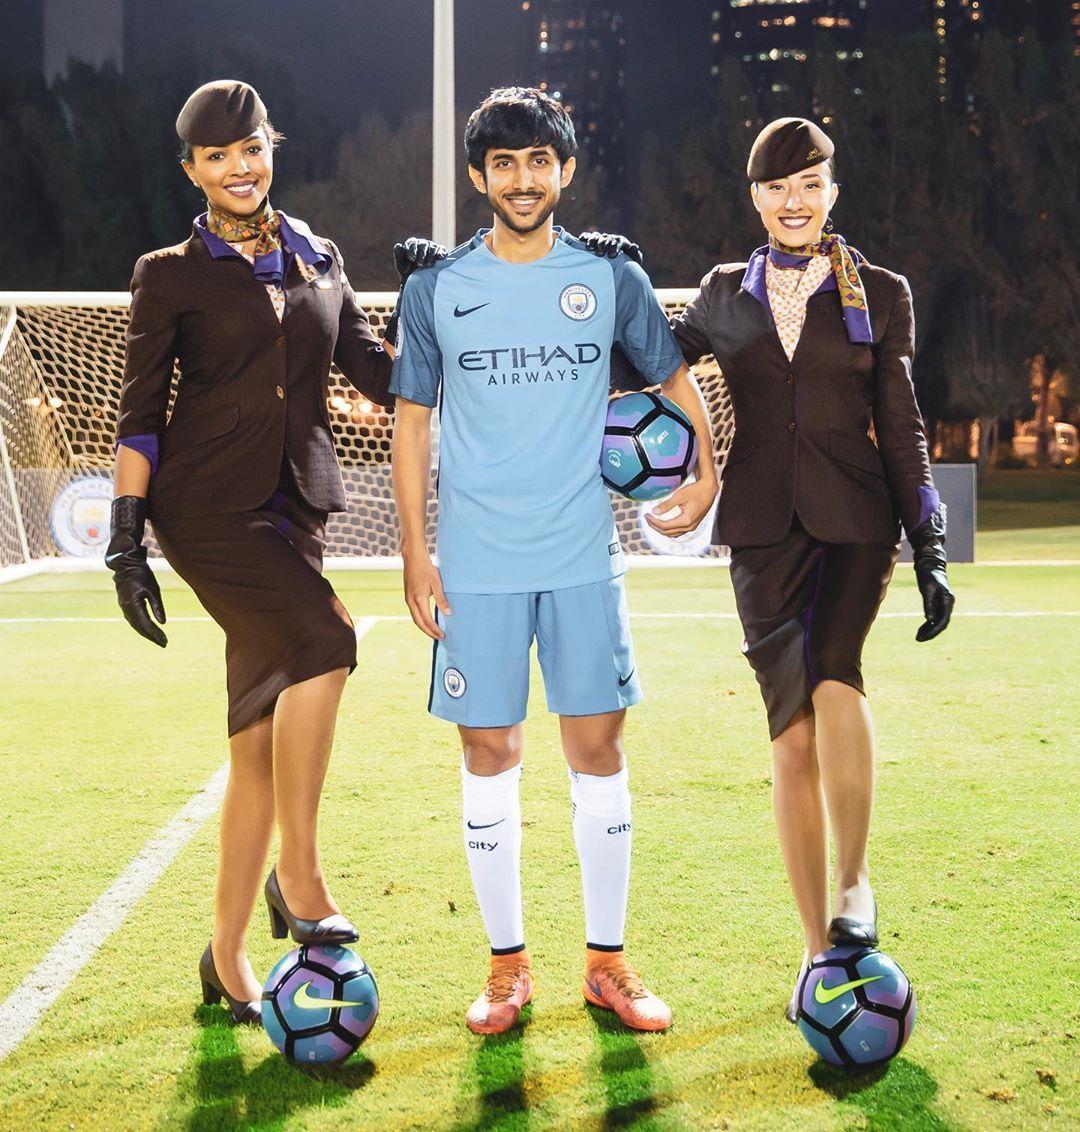 Abdulaziz On Instagram احلى لعب مع فريق مانشستر ستي وطيران الاتحاد من يلعب معانا I Had The Best Time Playing With Manchester City Travel